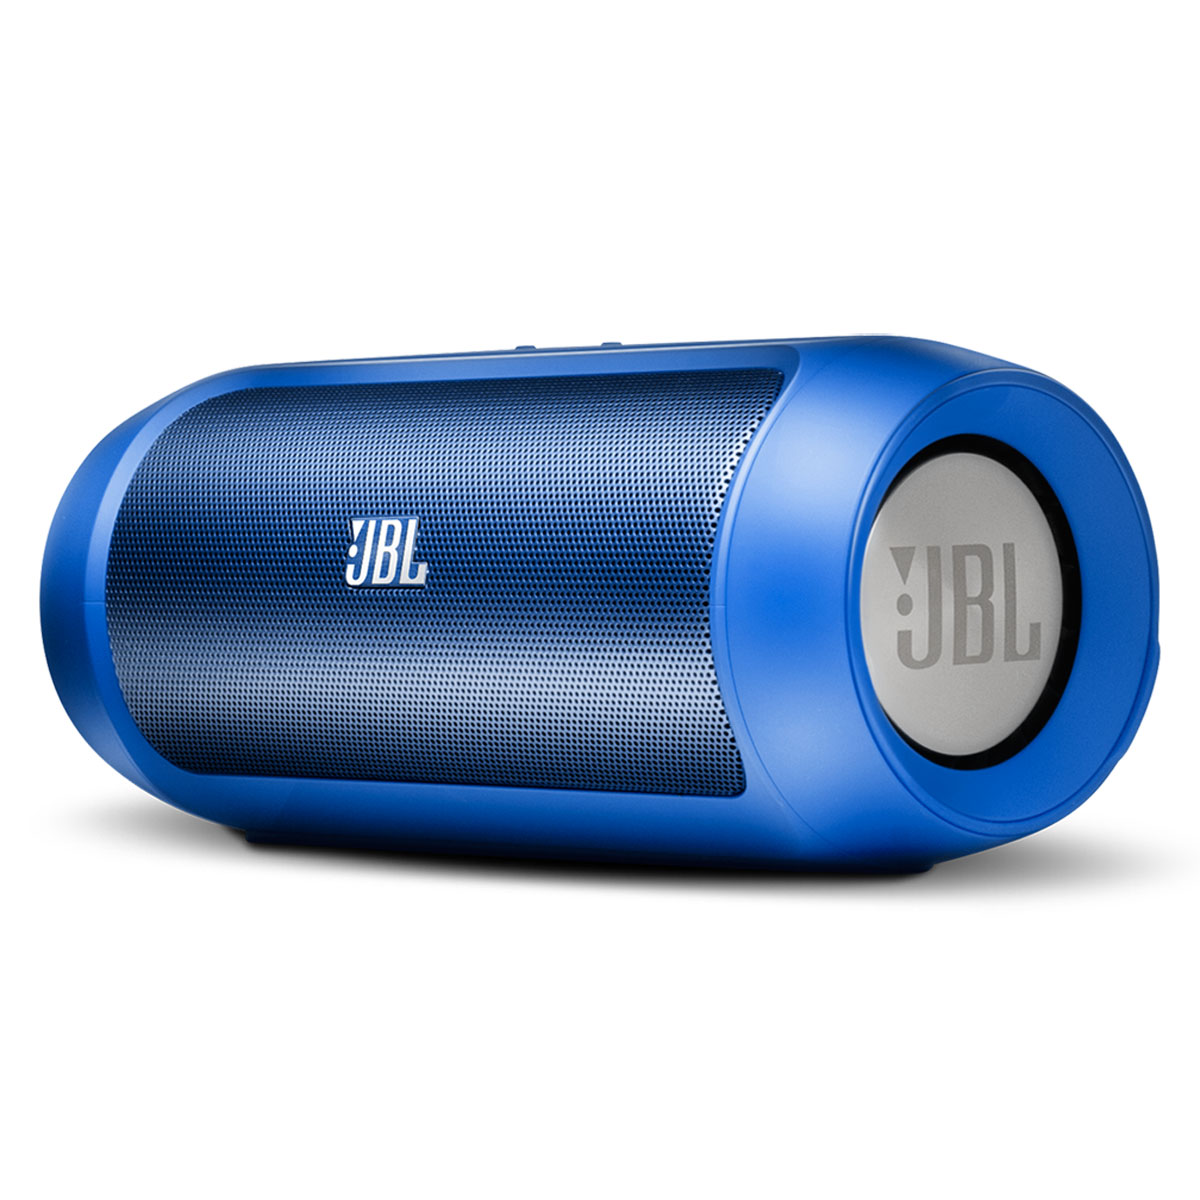 jbl charge 2 bleu chargeiiblueu achat vente dock enceinte bluetooth sur. Black Bedroom Furniture Sets. Home Design Ideas